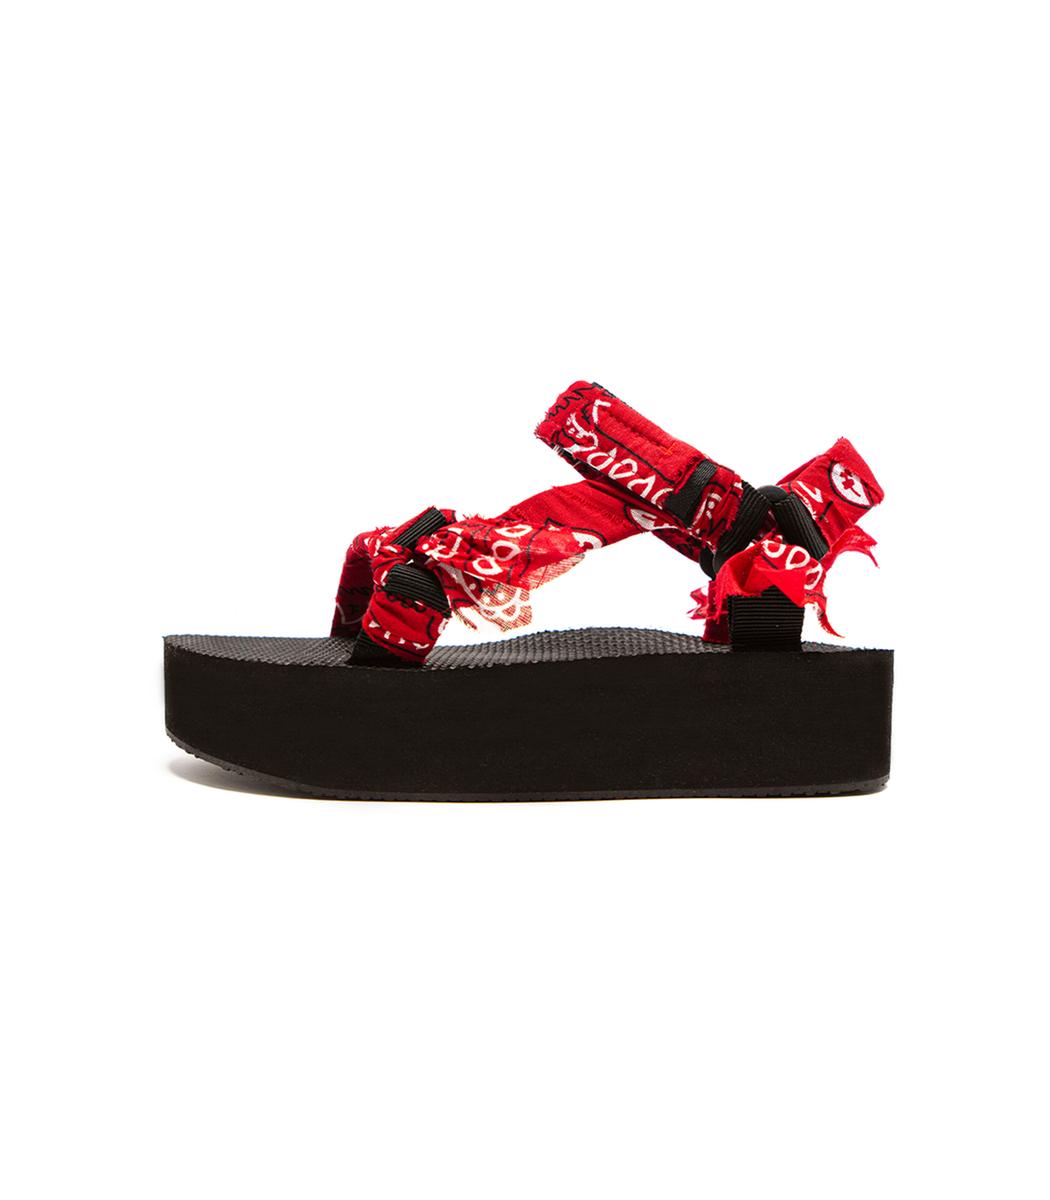 Arizona Love Platforms Trekky Platform Sandal in Red